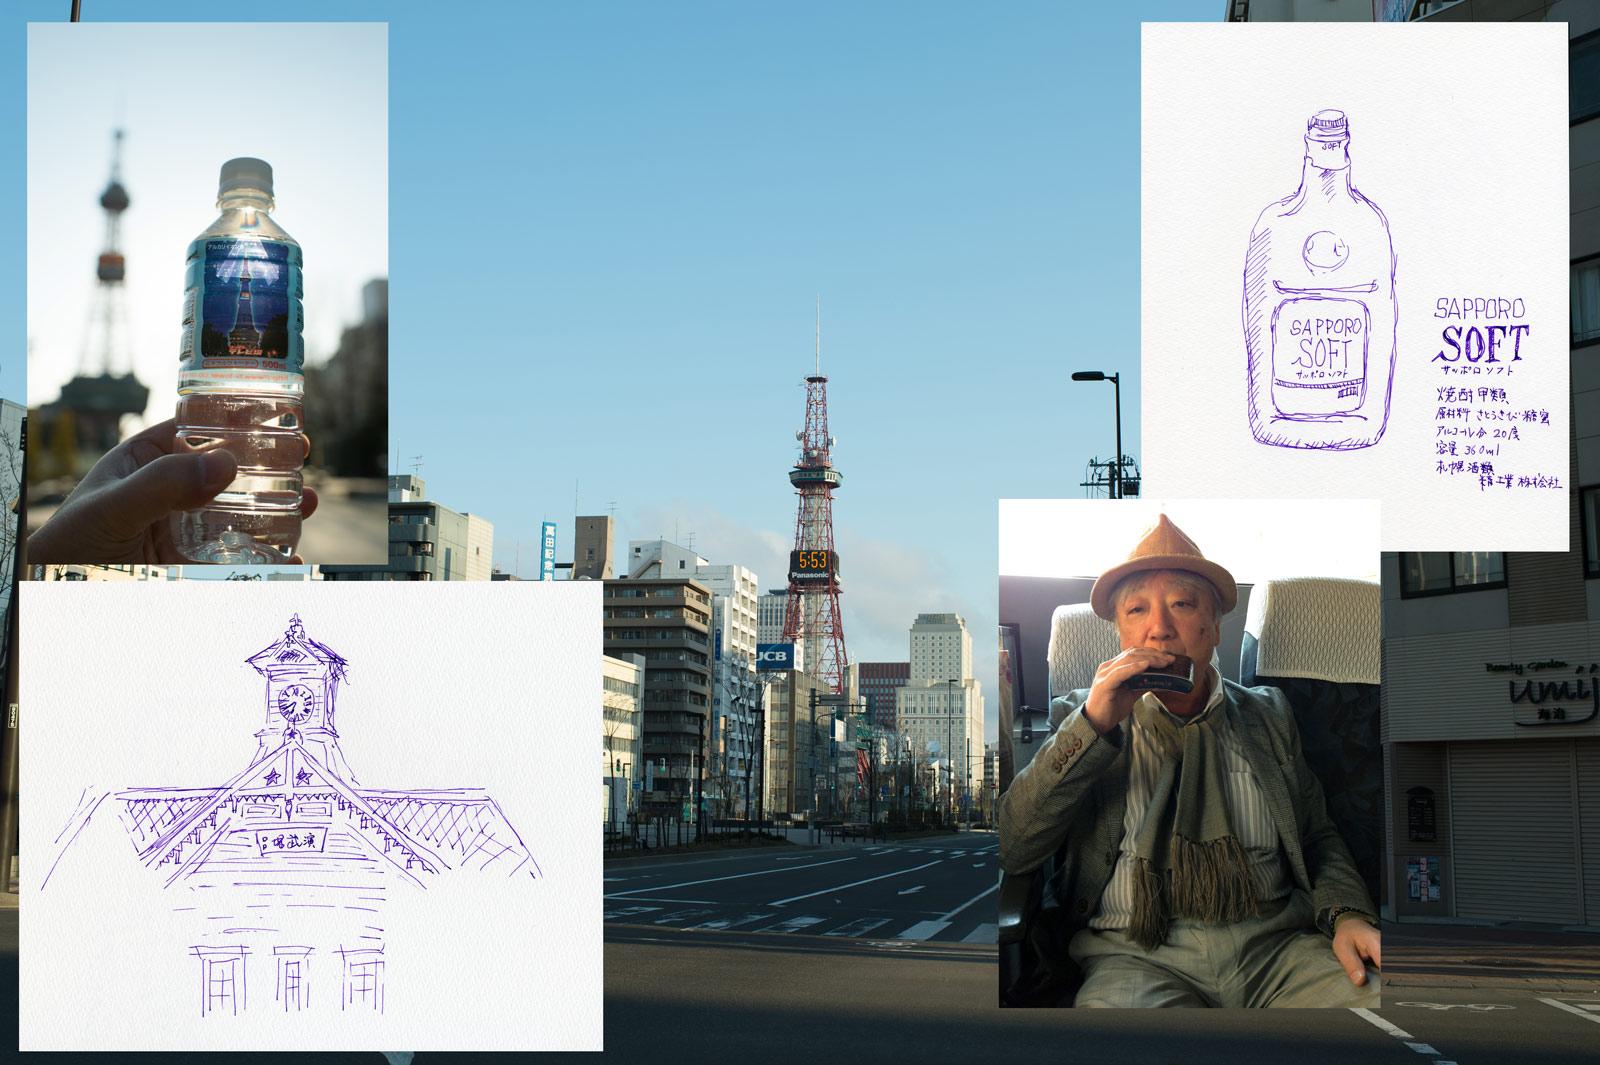 社員旅行北海道2日目(バスツアー)_a0271402_10291452.jpg